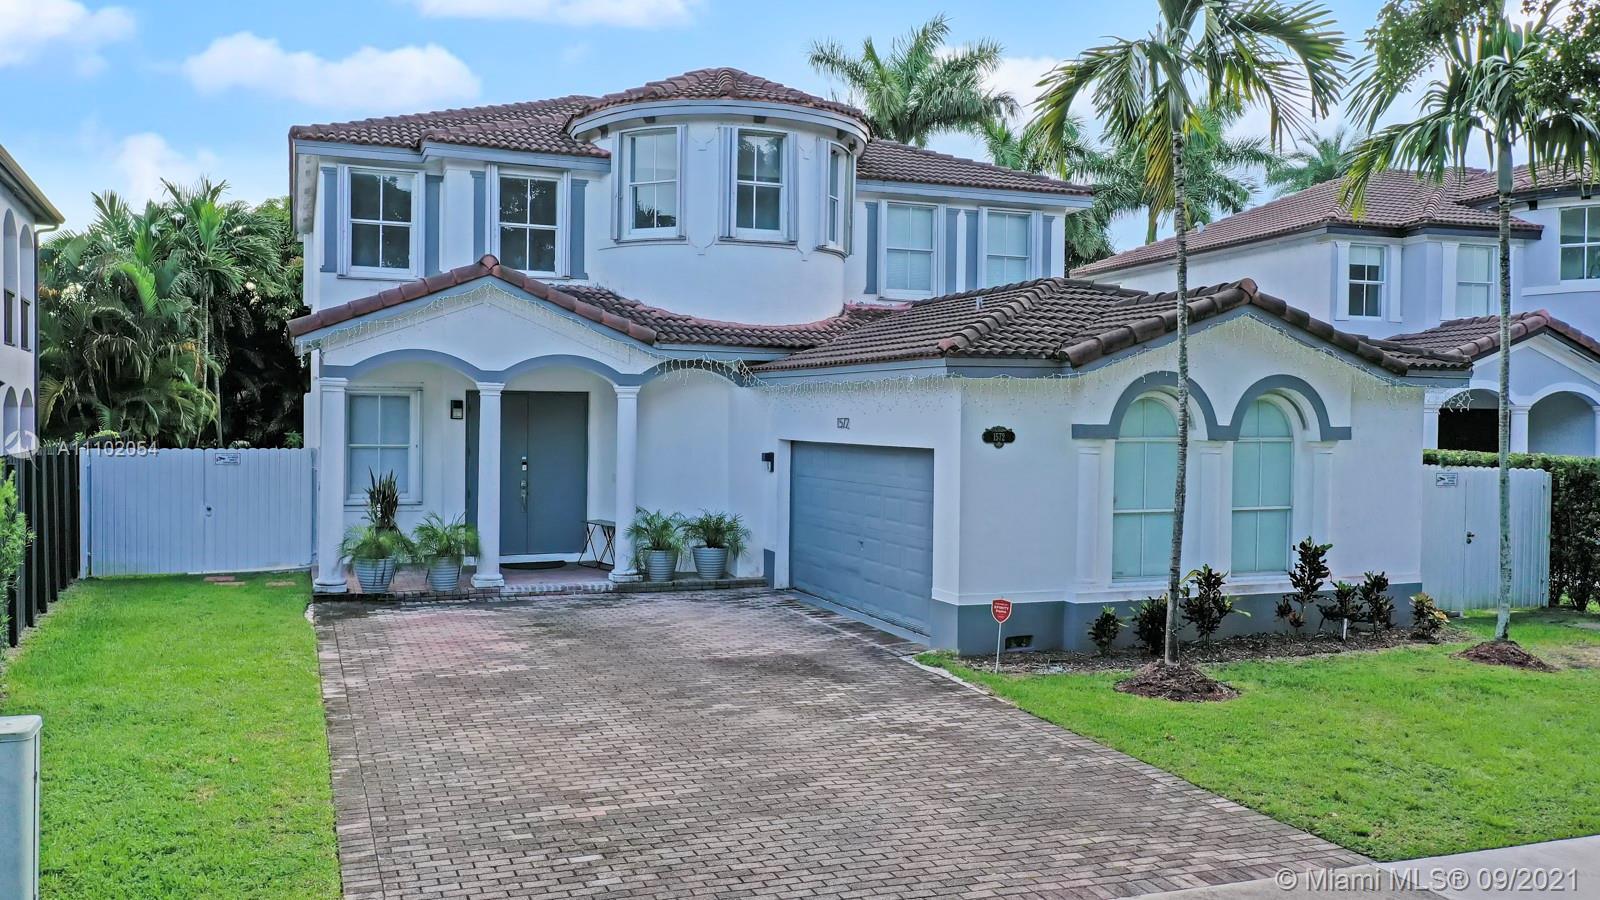 Single Family Home,For Sale,1572 SW 150th Ave, Miami, Florida 33194,Brickell,realty,broker,condos near me